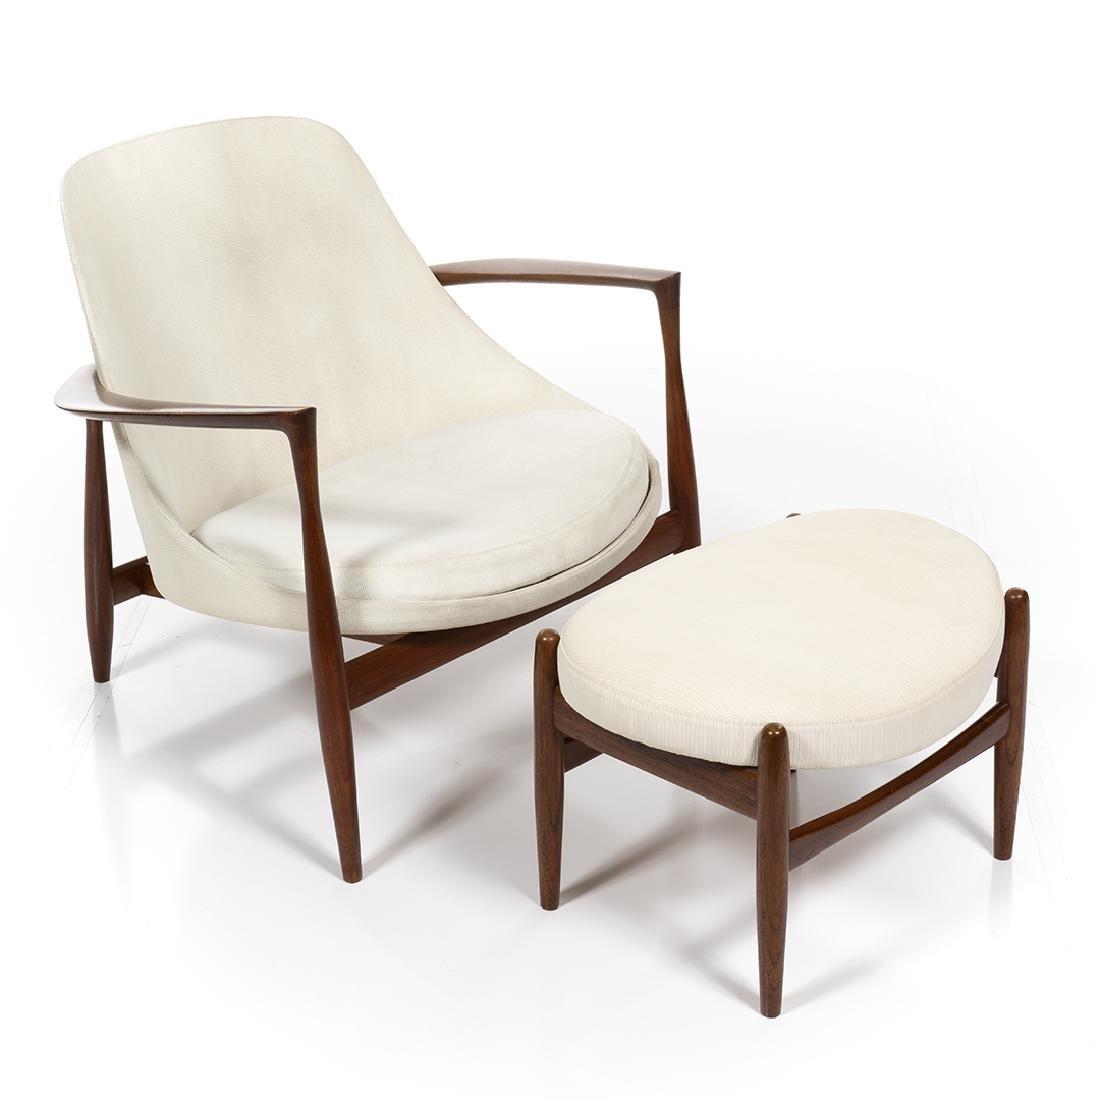 IB Kofod Larsen Elizabeth Chairs - 9